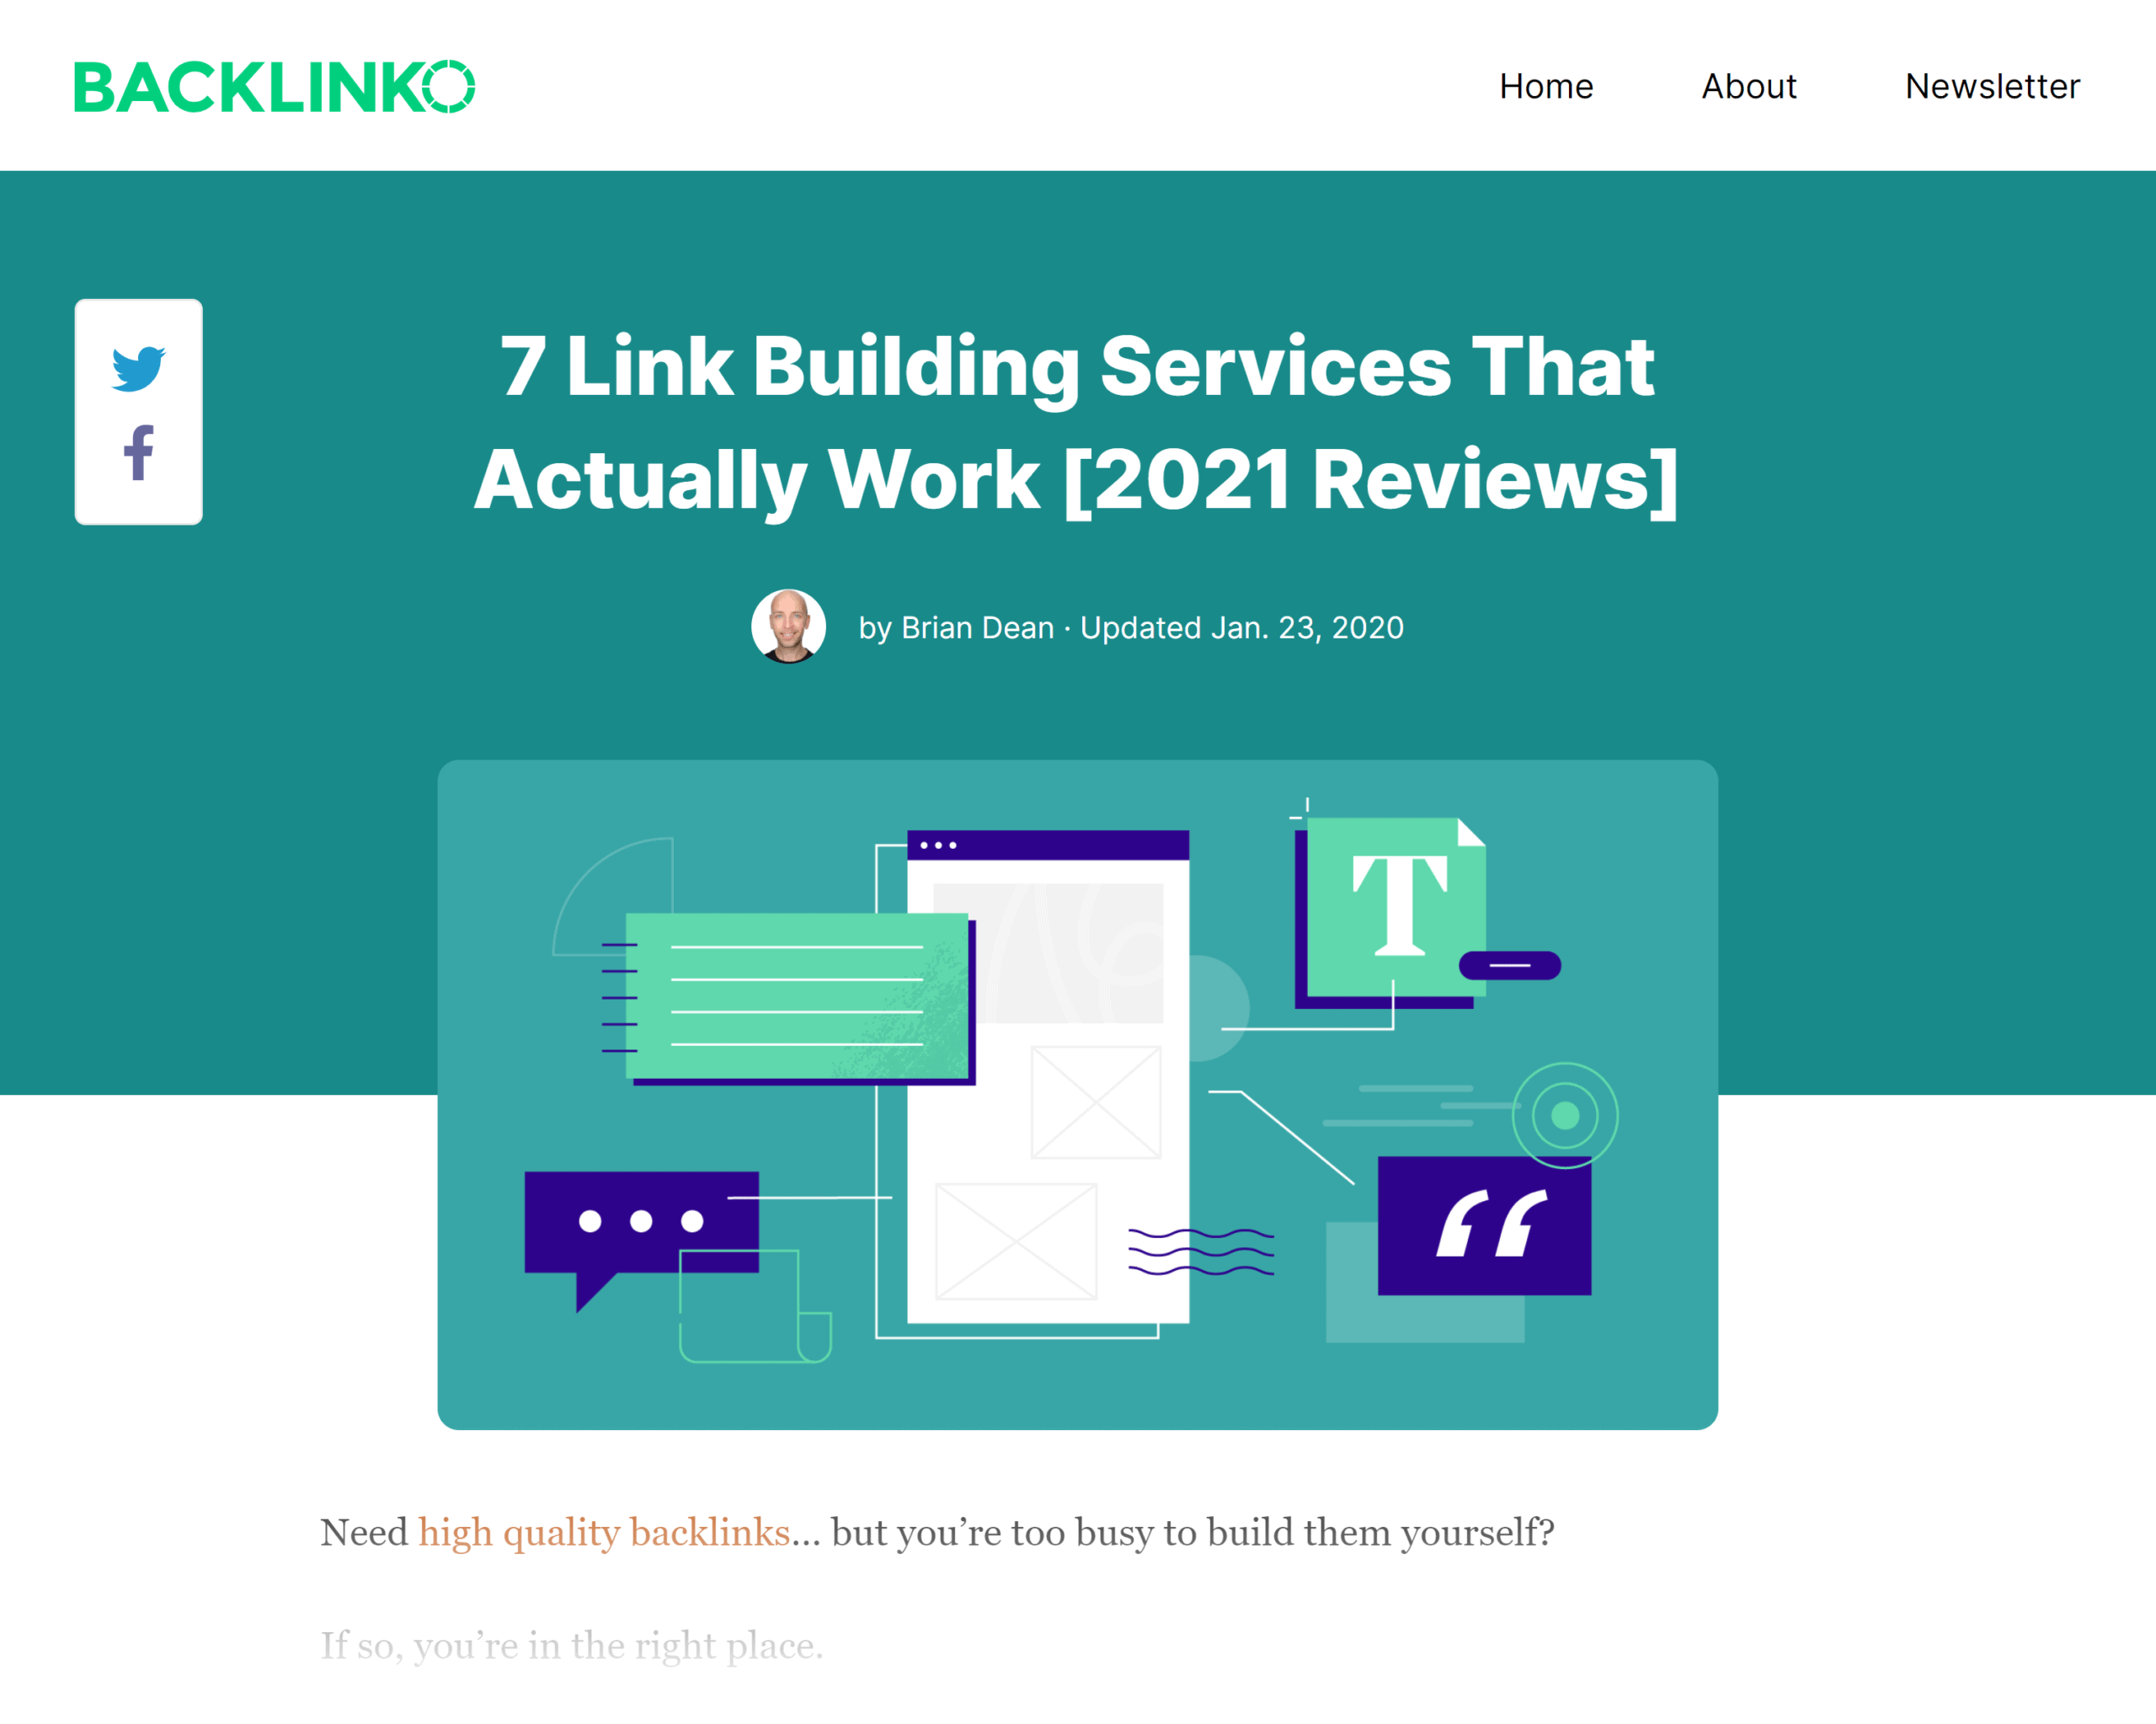 Backlinko – Link building services